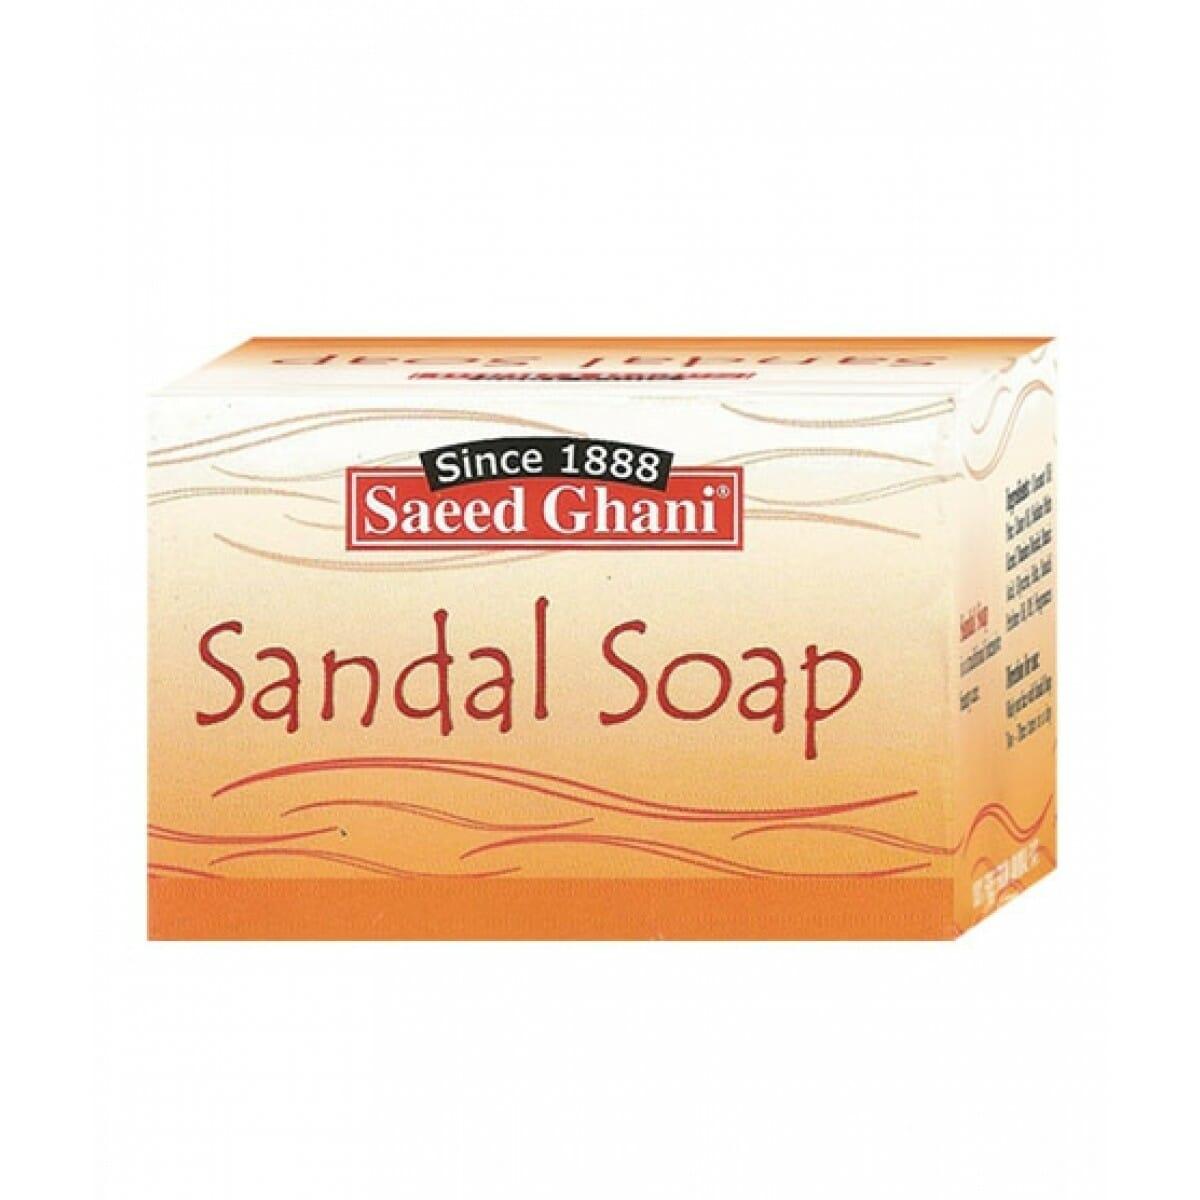 Saeed Ghani Sandal Soap Best Whitening Soap In Pakistan